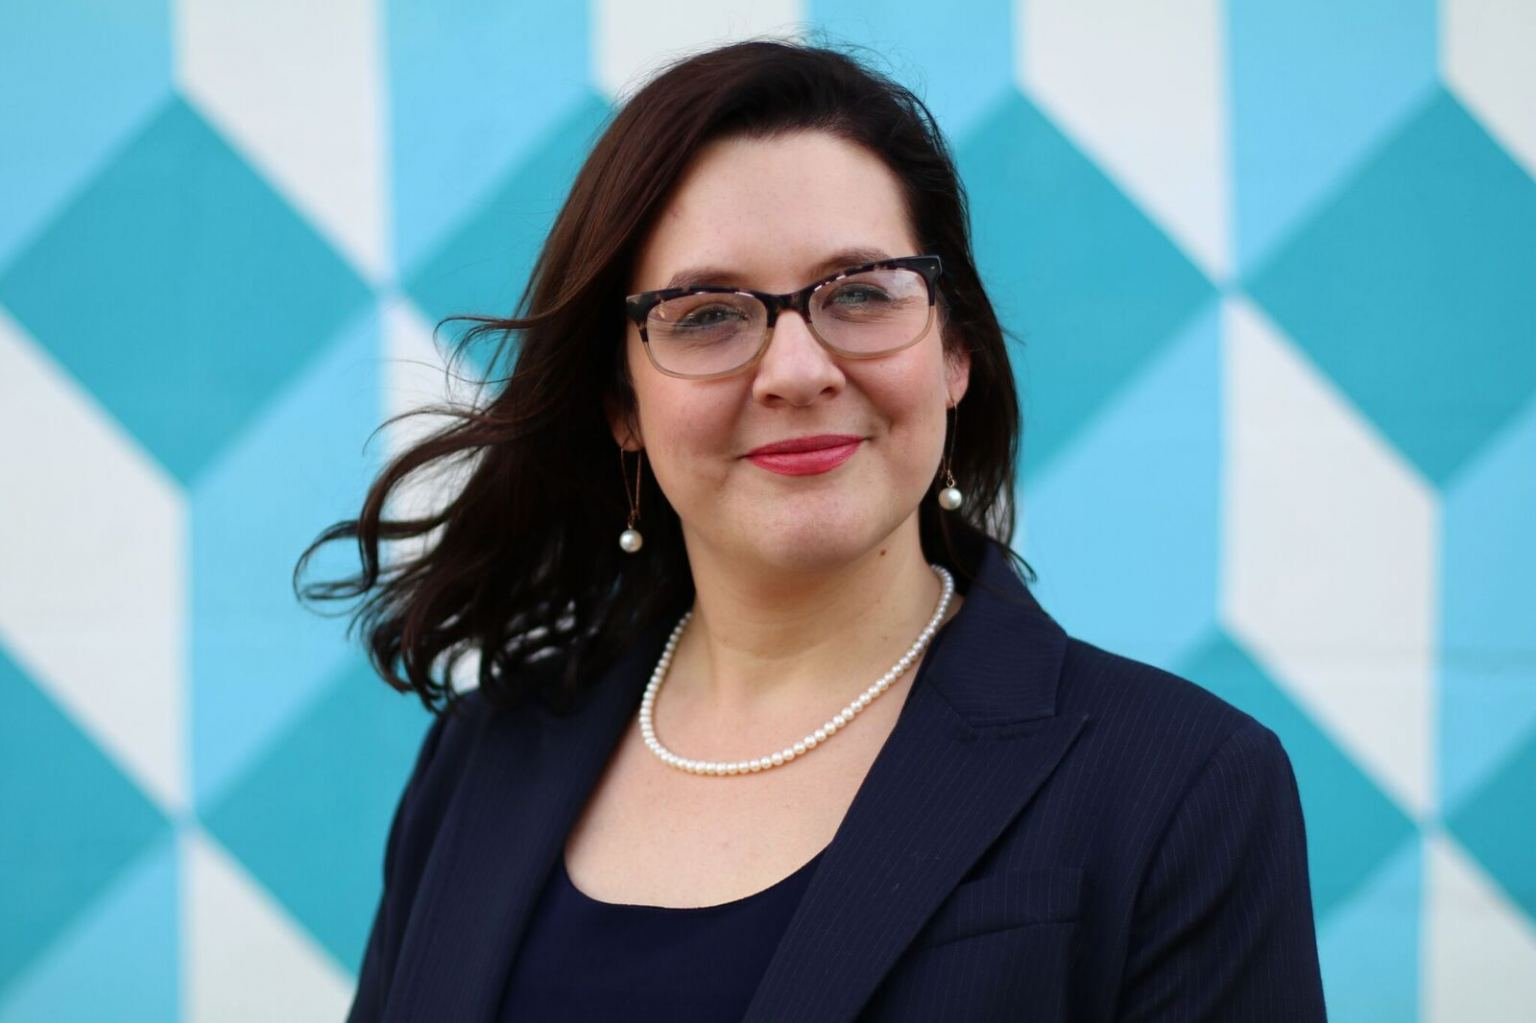 Dr. Olysha Magruder